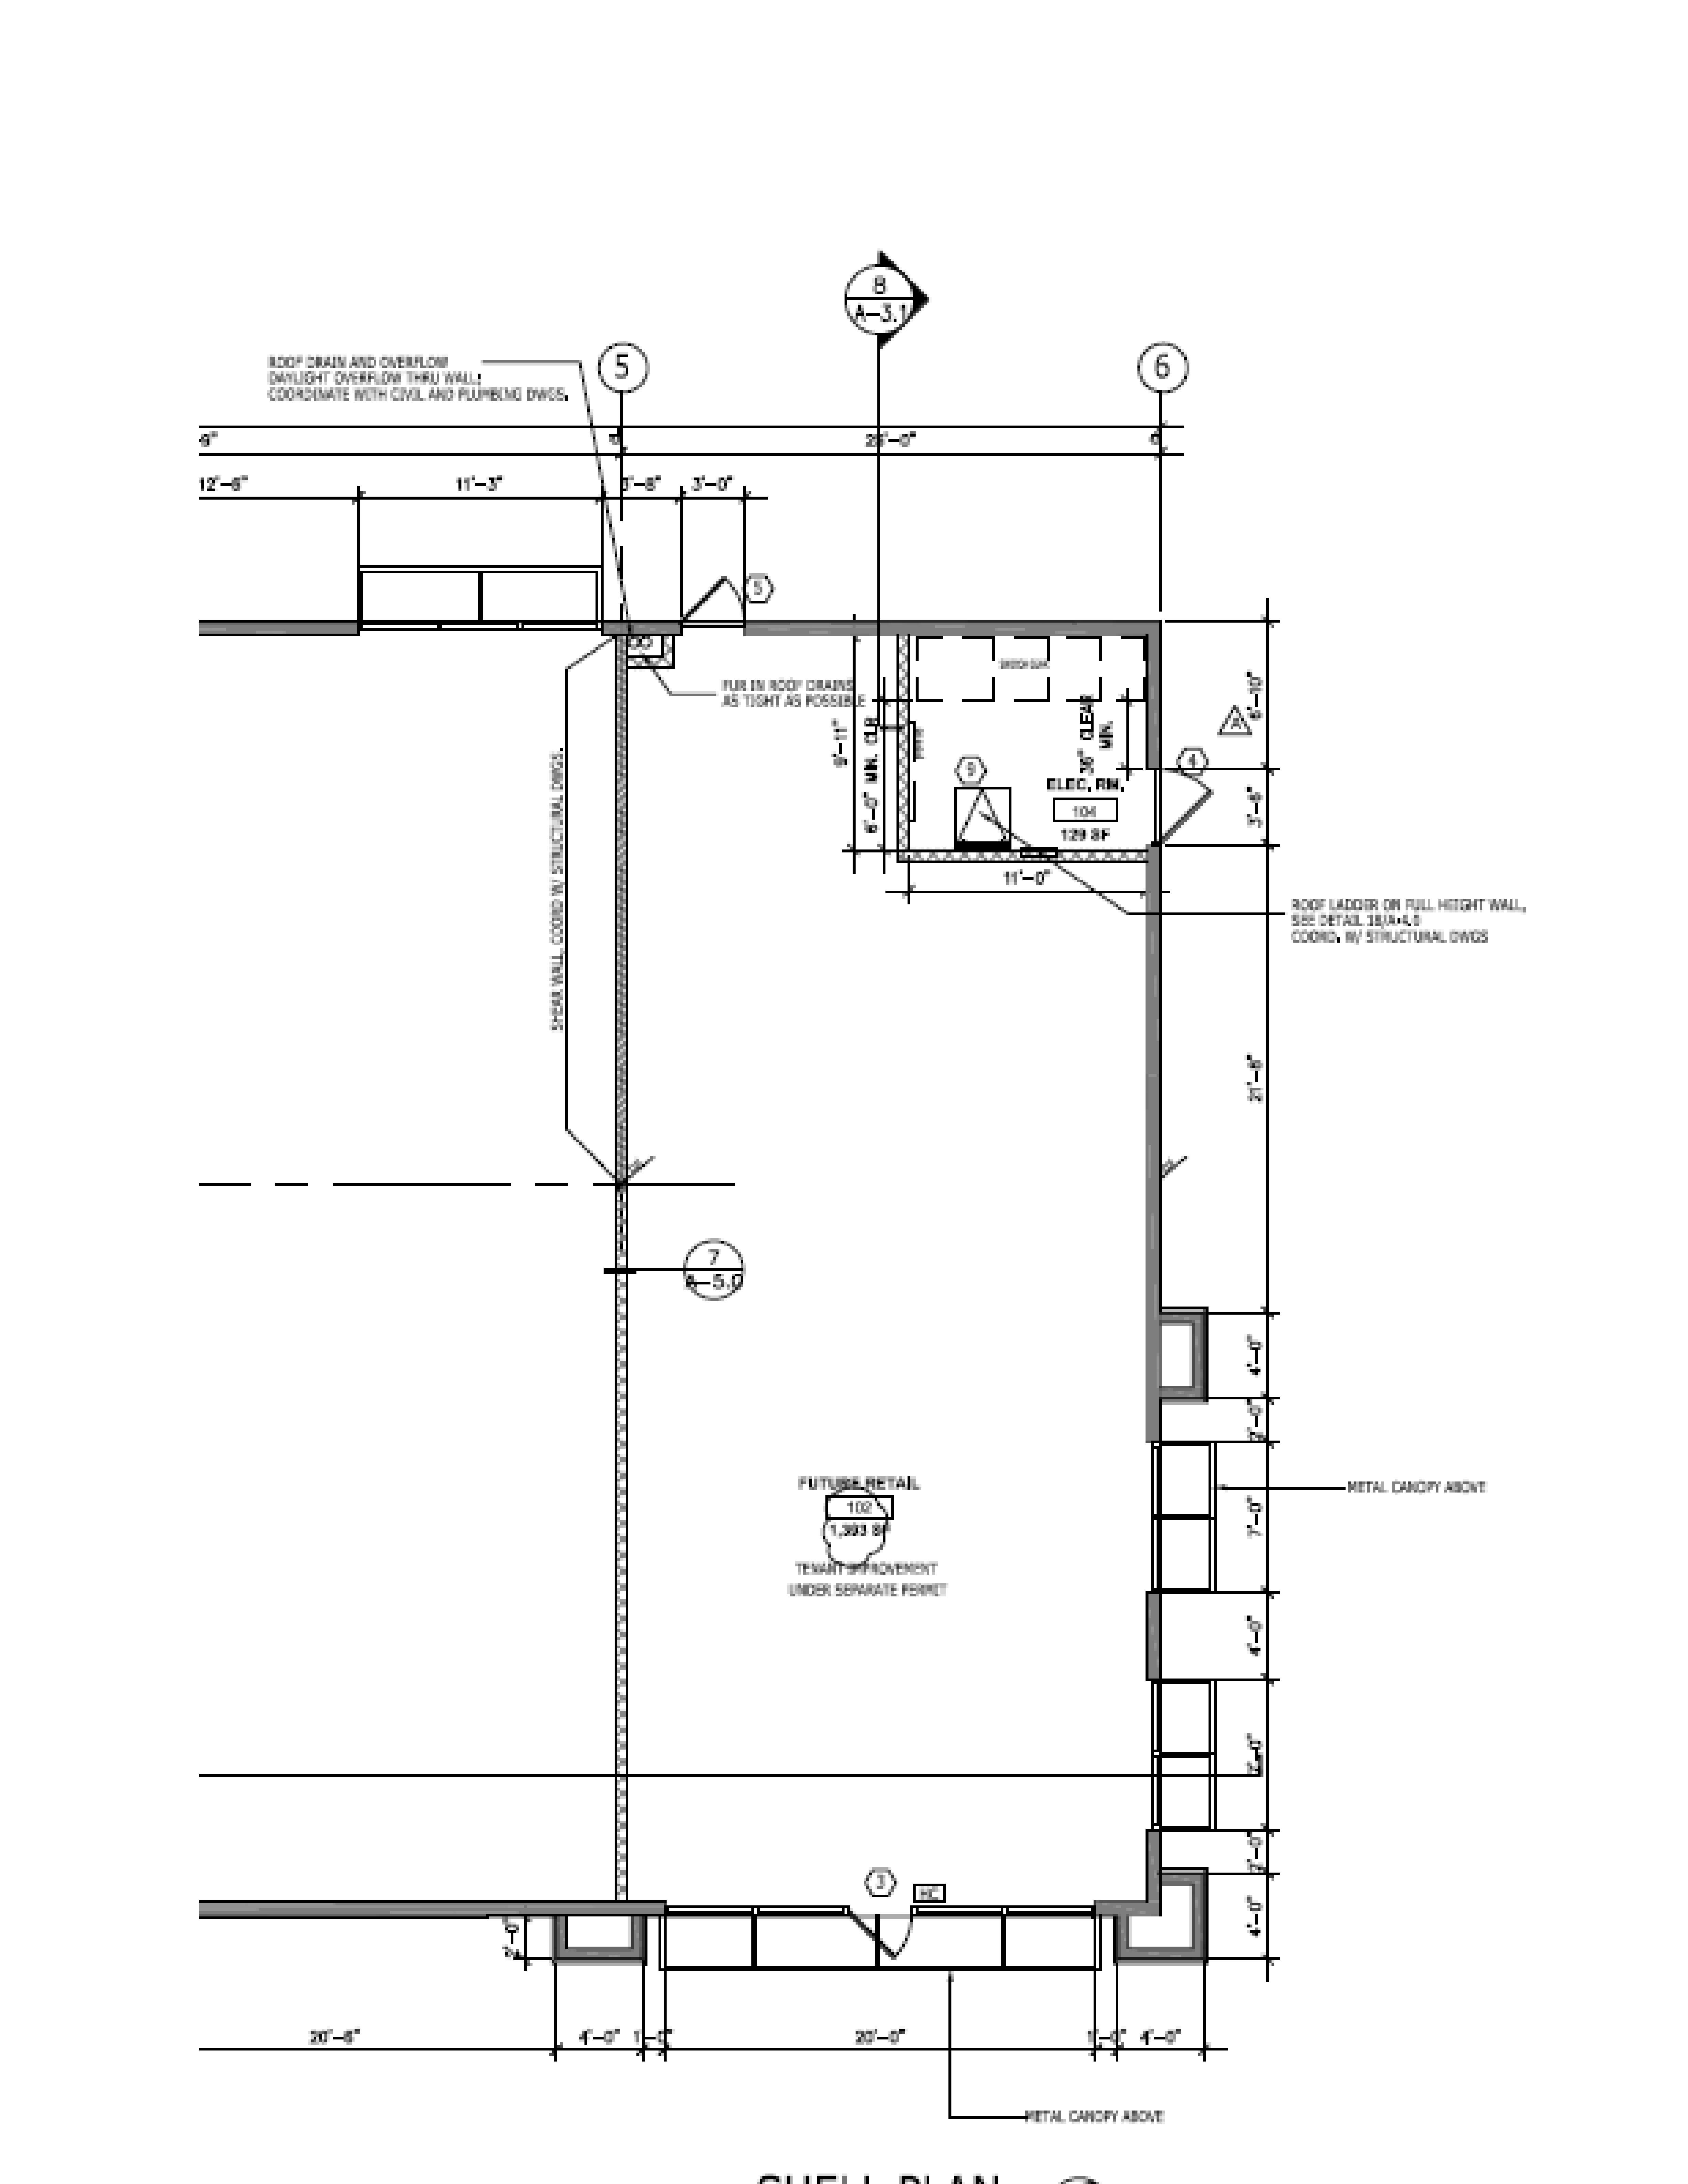 Orangecrest Towne Center: site plan